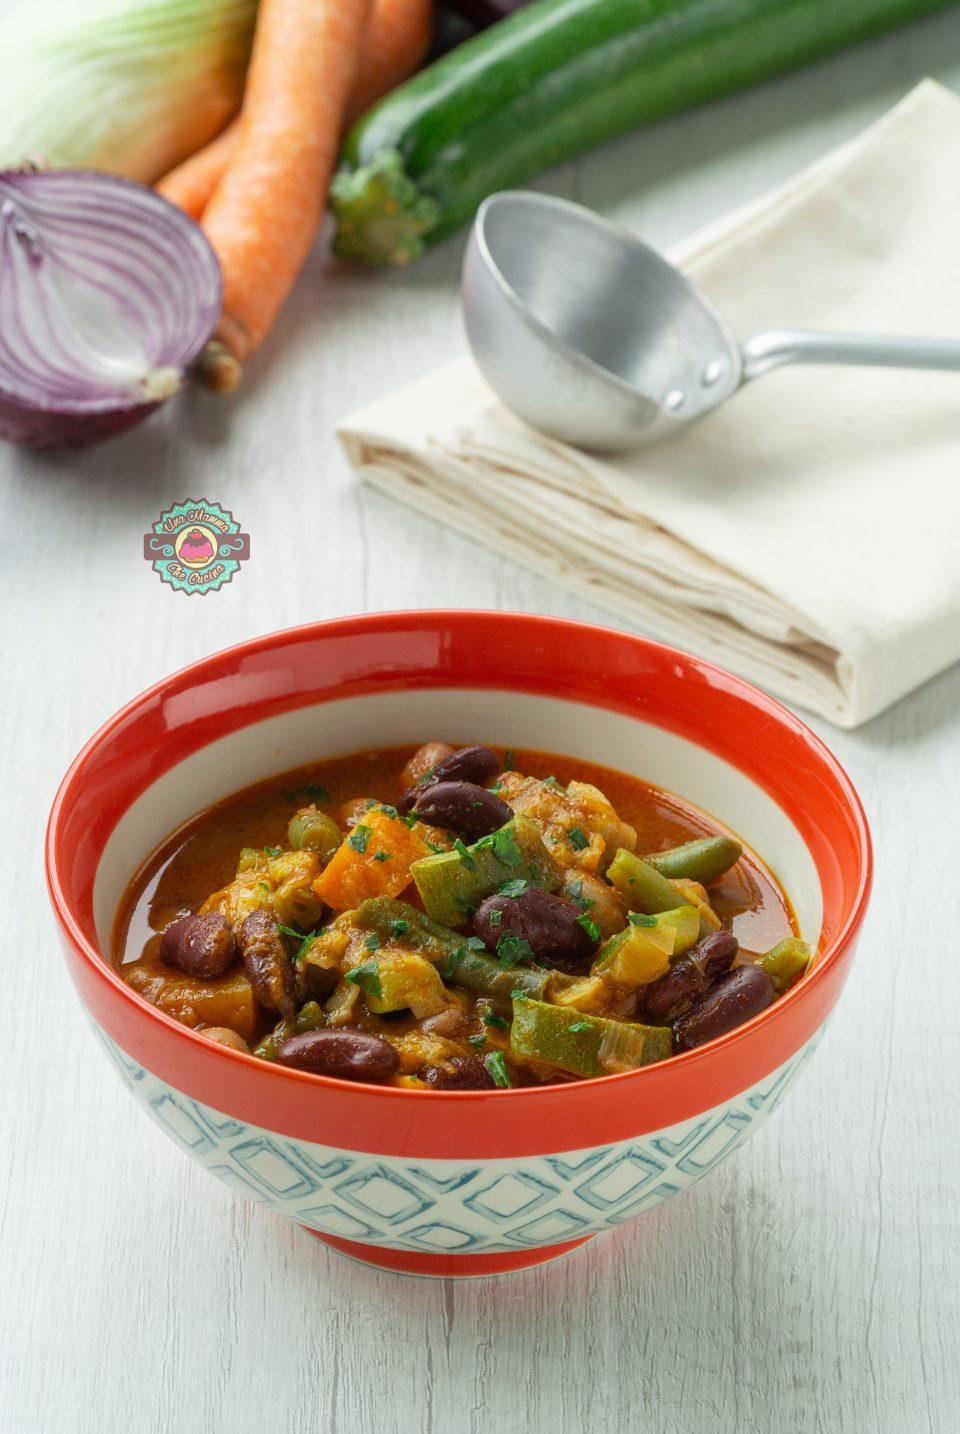 Zuppa provenzale con paprika affumicata